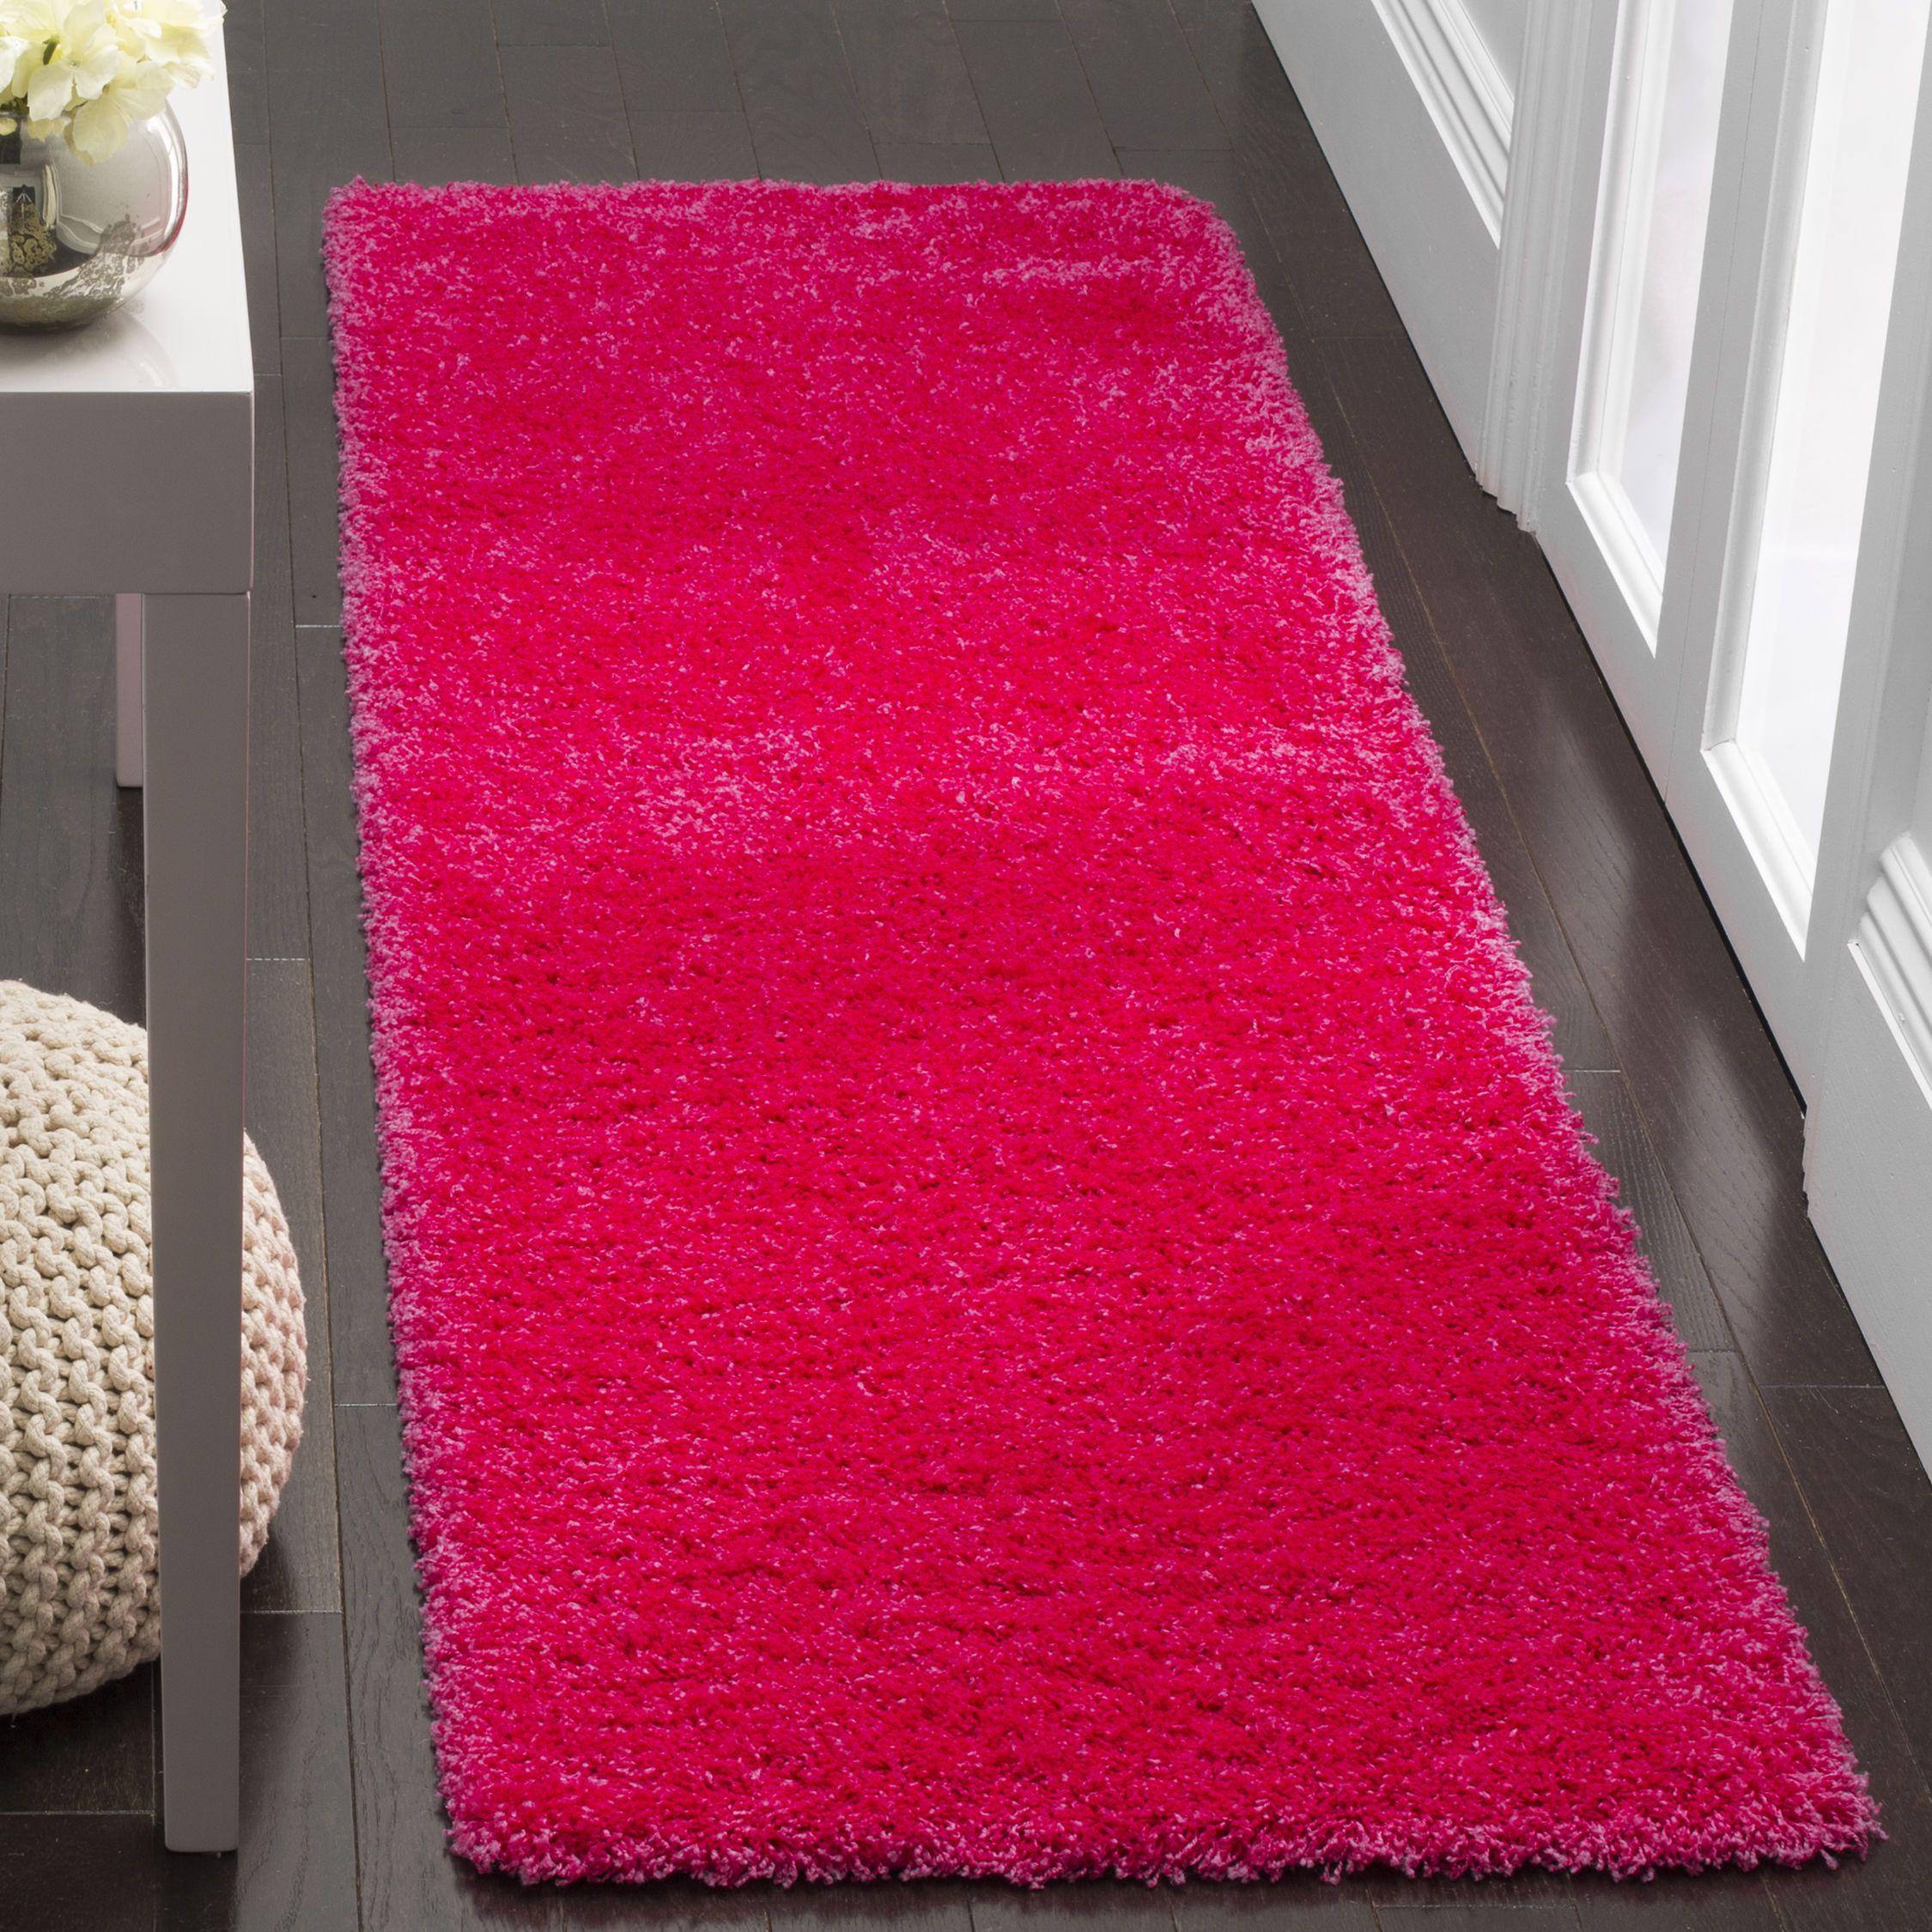 For The Unicorn Room Unicorn Hotpink Arearugs Bright Interiordesign Homedecor Pink Area Rug Shag Area Rug Area Rugs